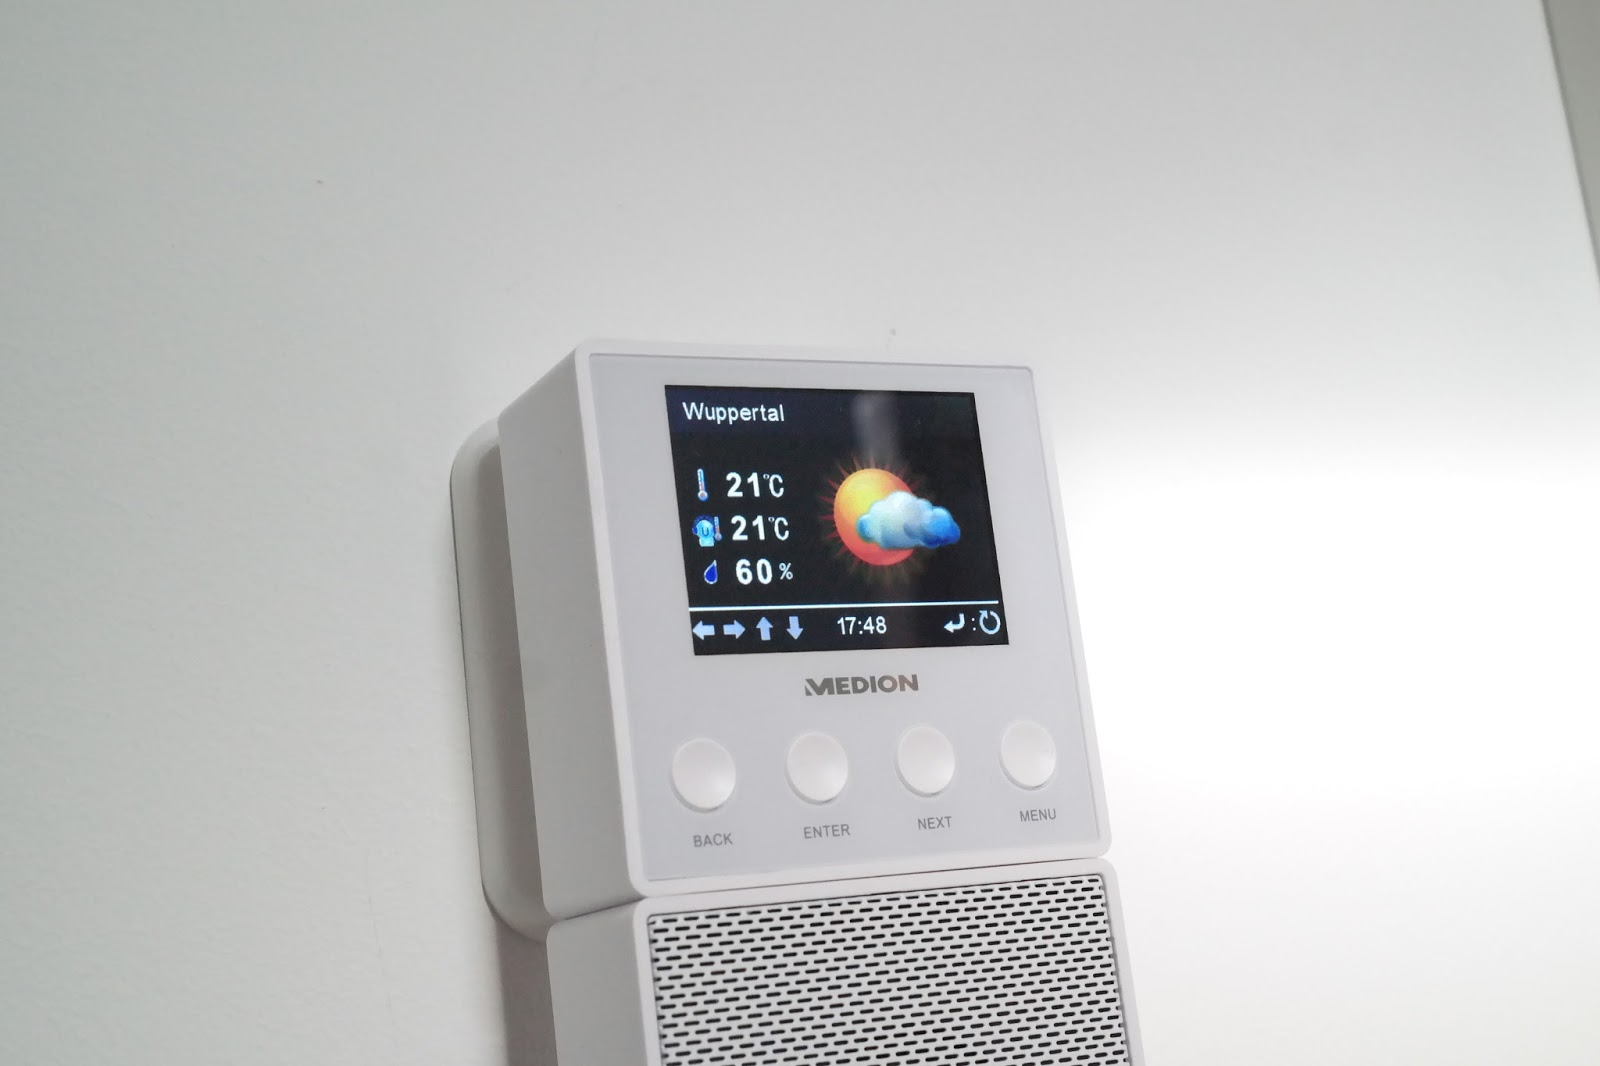 Badezimmer Radio Steckdose Unterputz U2013 ElvenBride.com